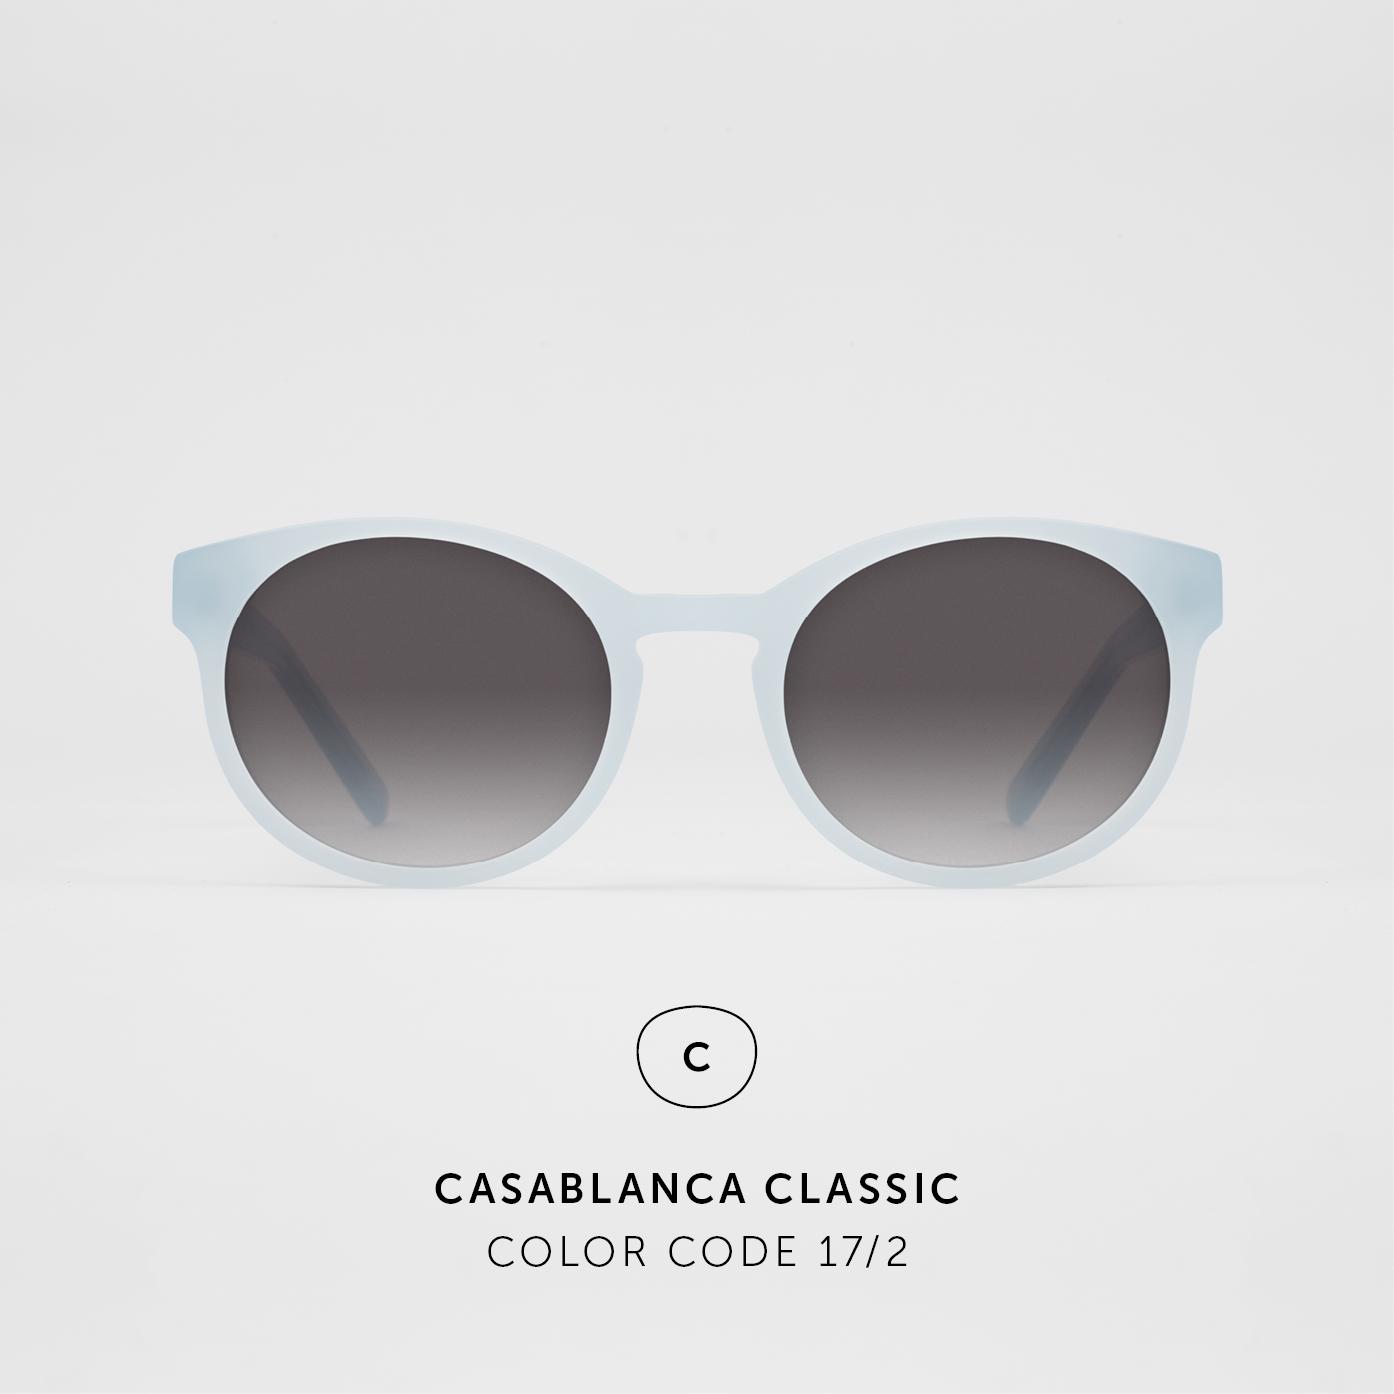 CasablancaClassic54.jpg